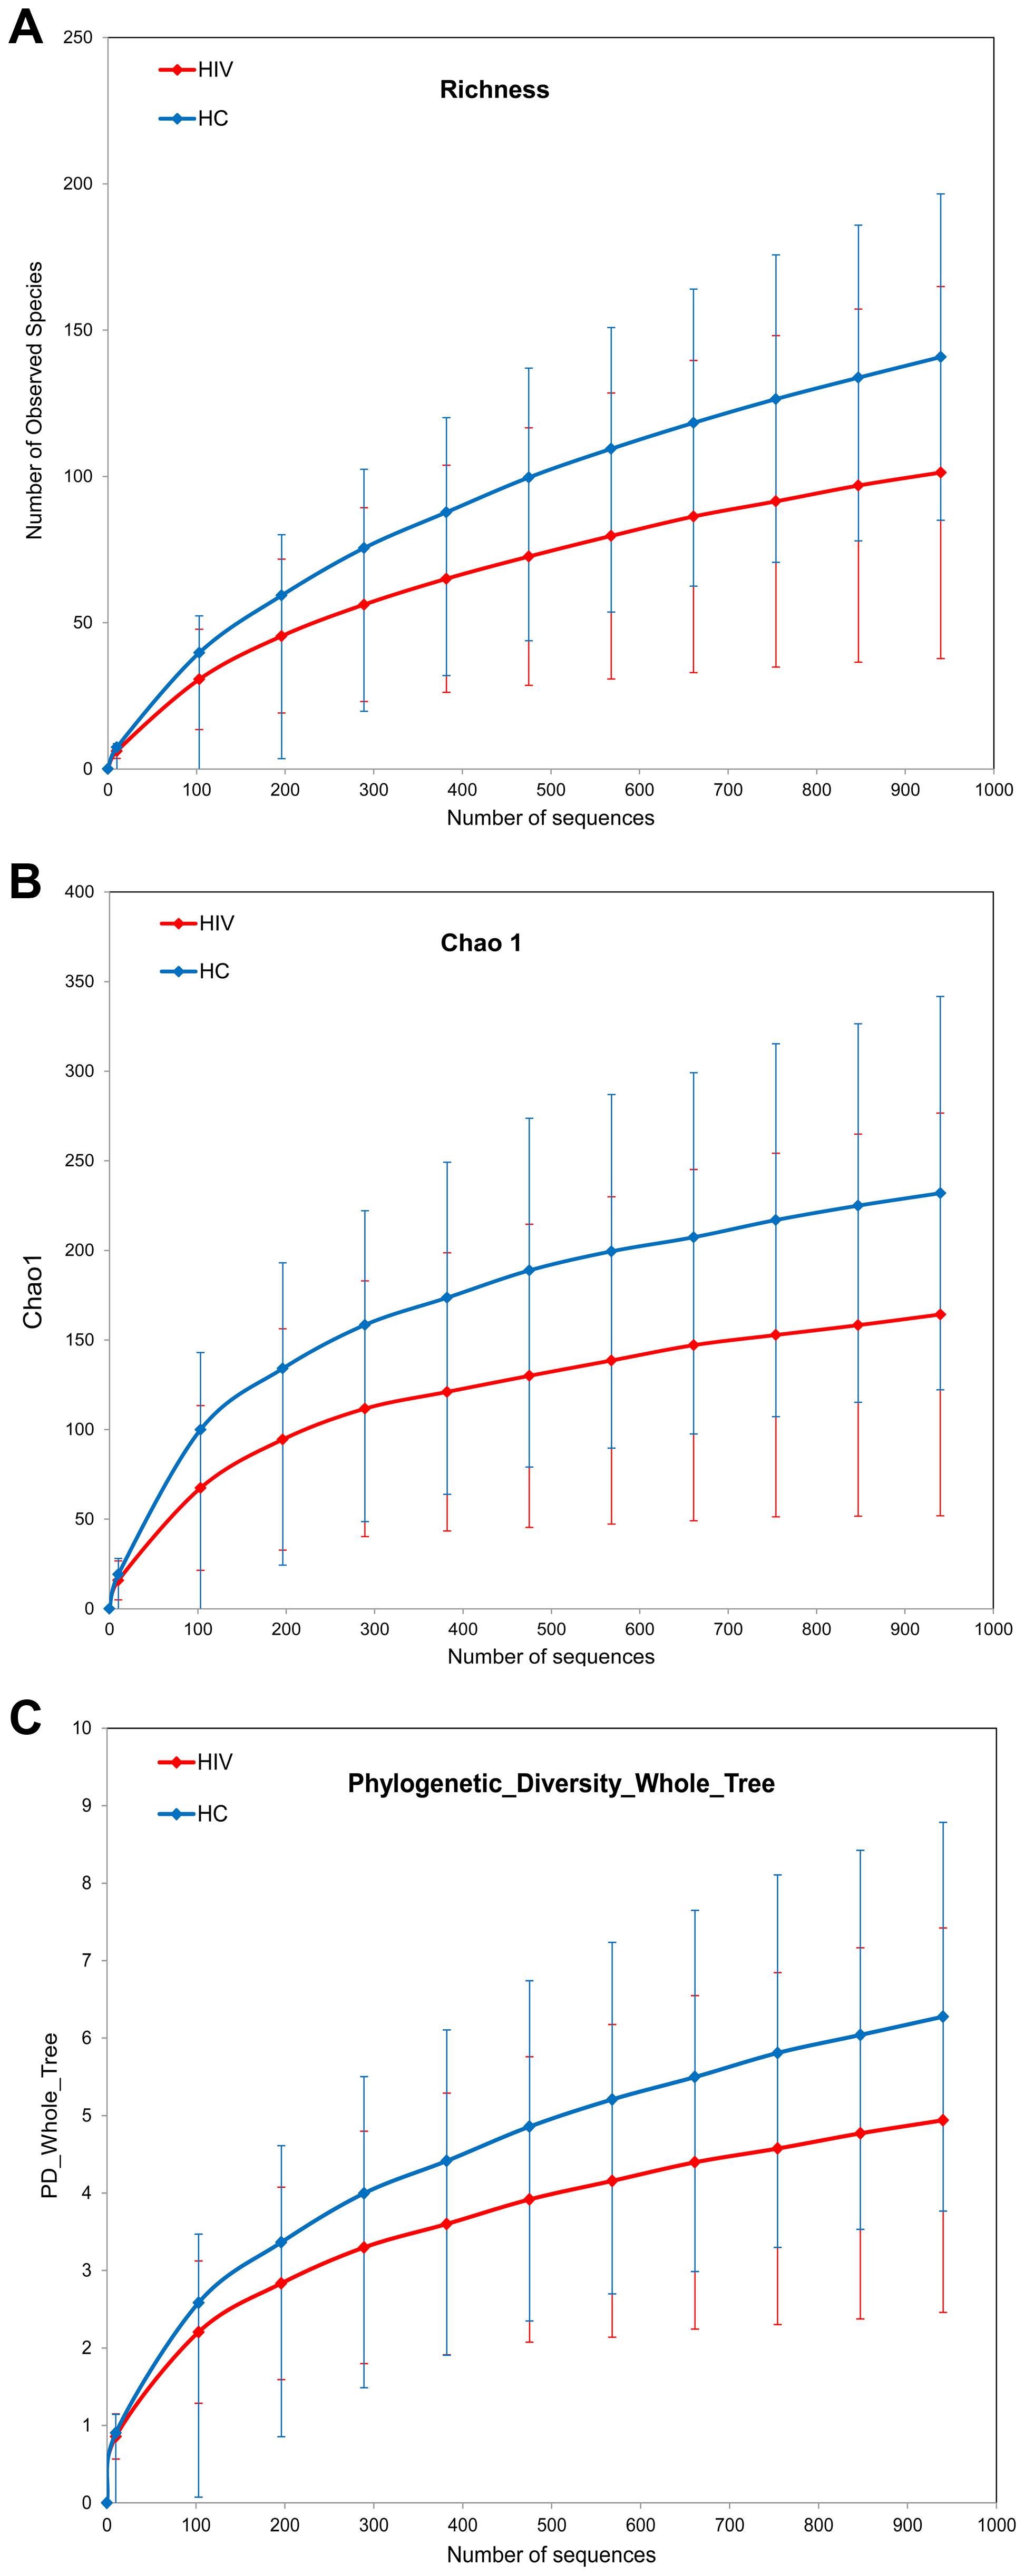 Diversity indices in HIV samples versus control samples.